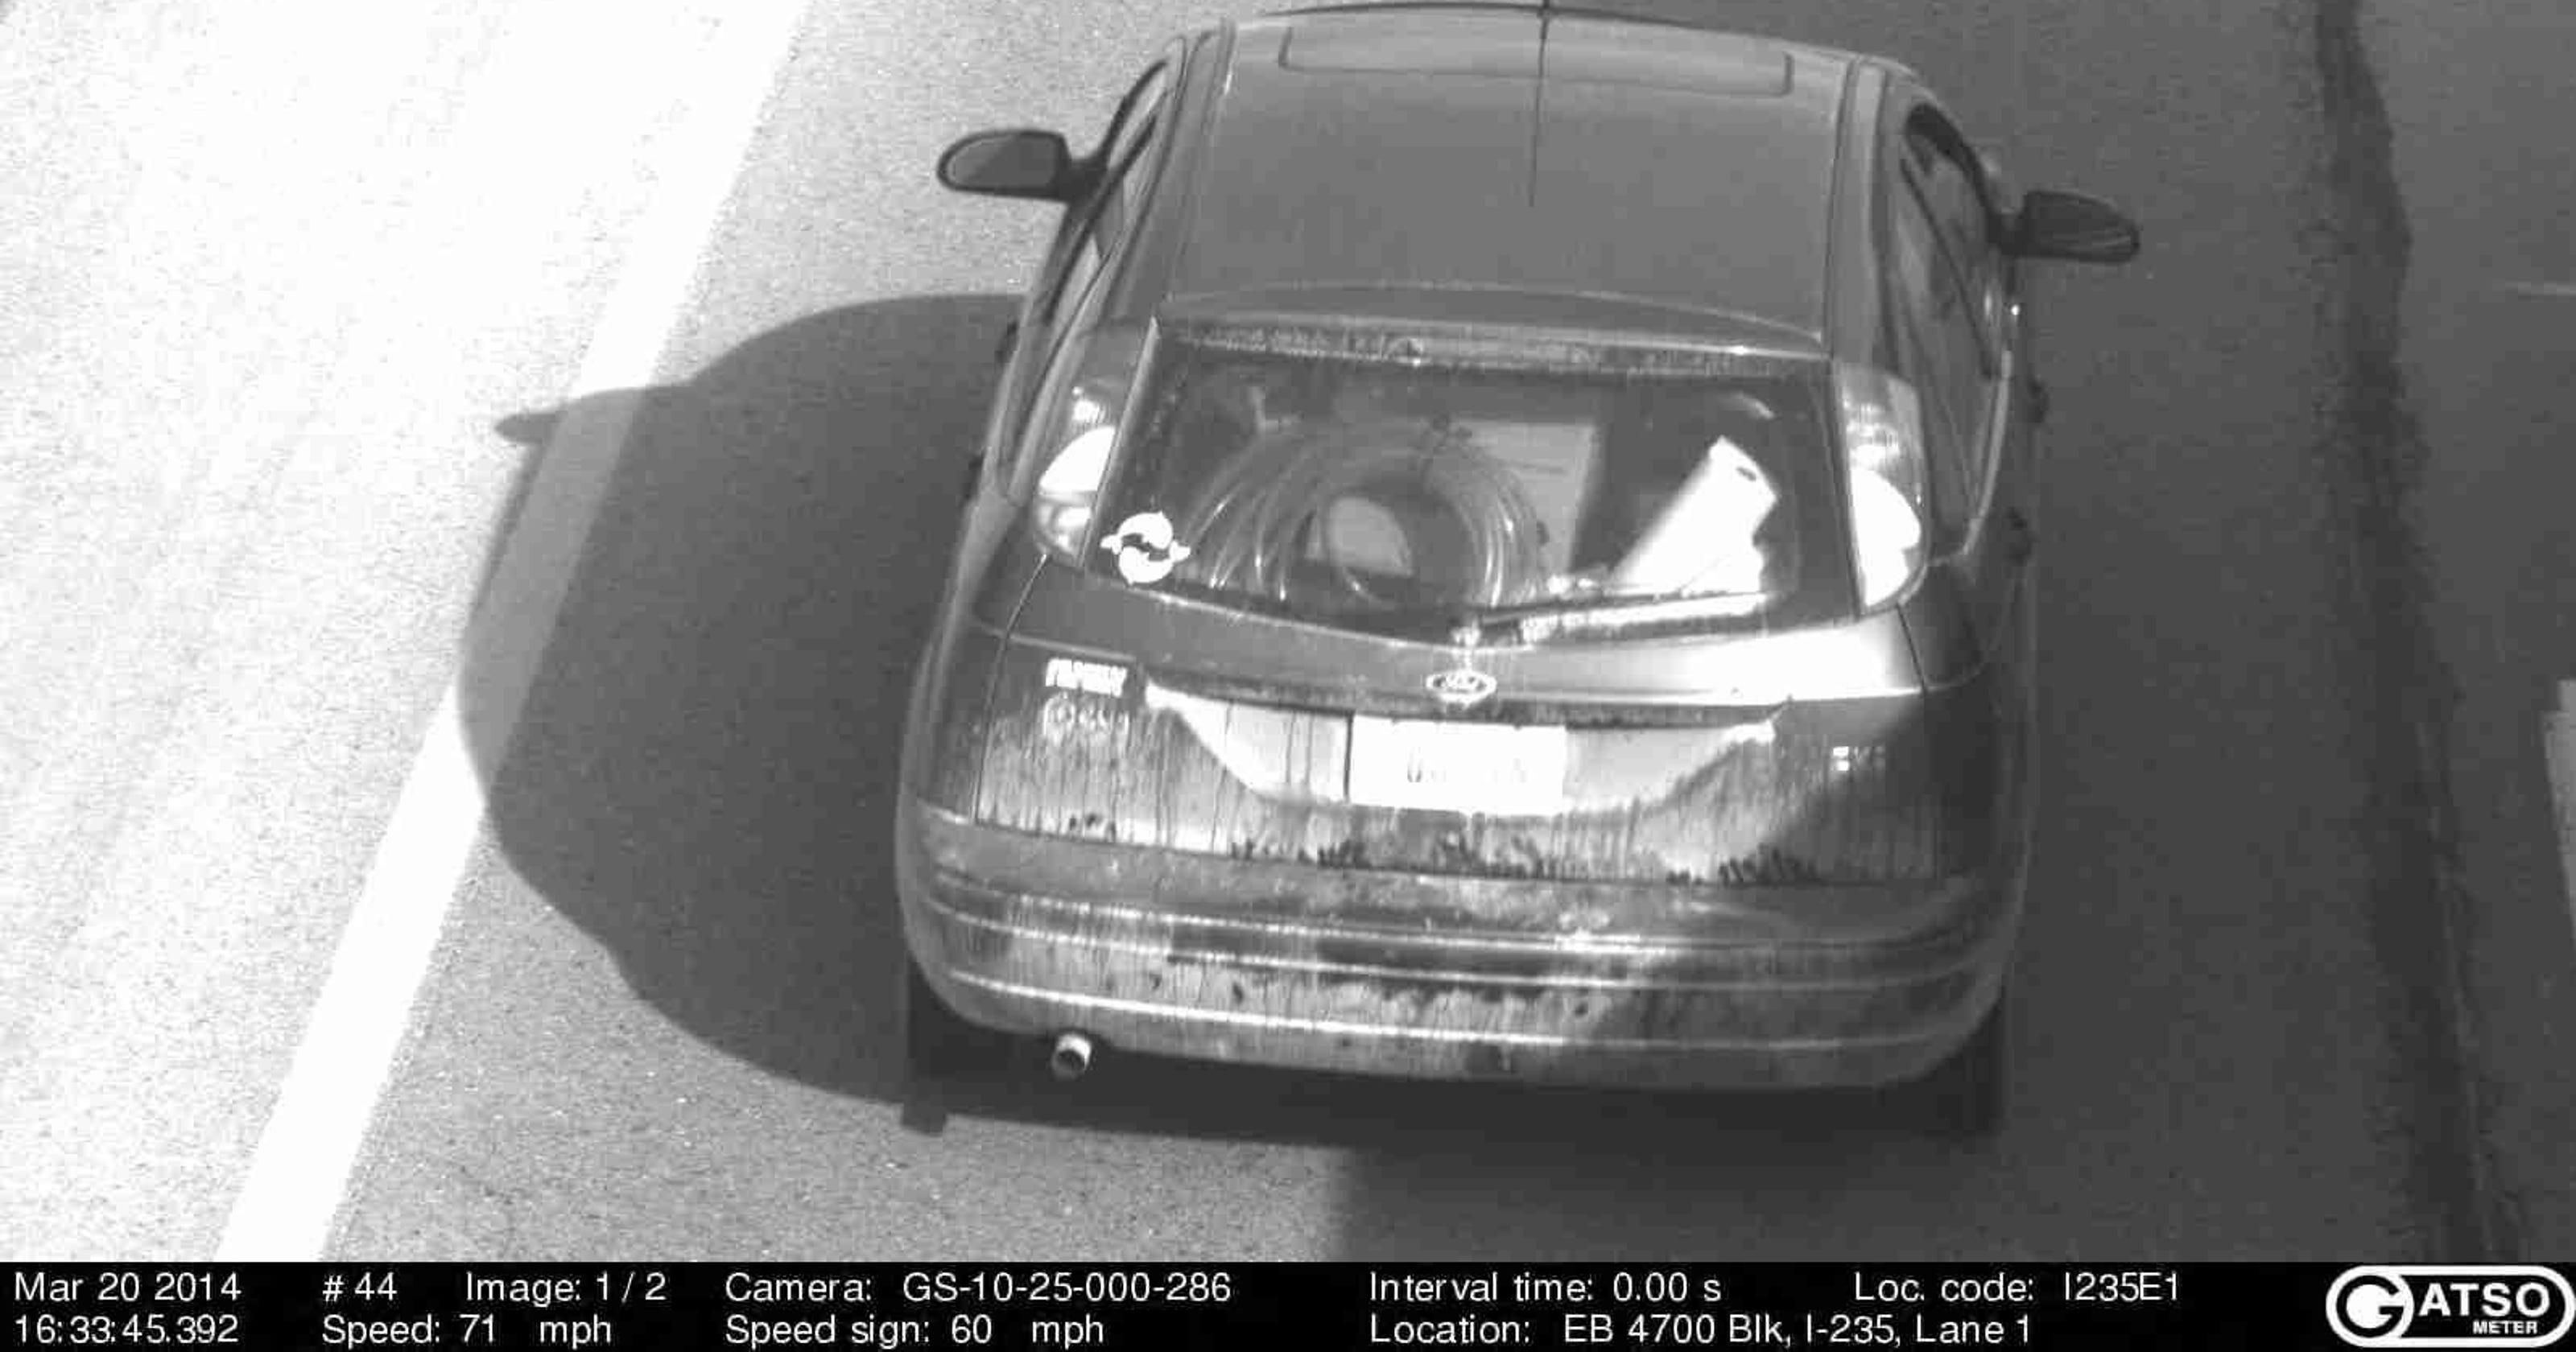 Traffic-camera appeals often successful, but few try